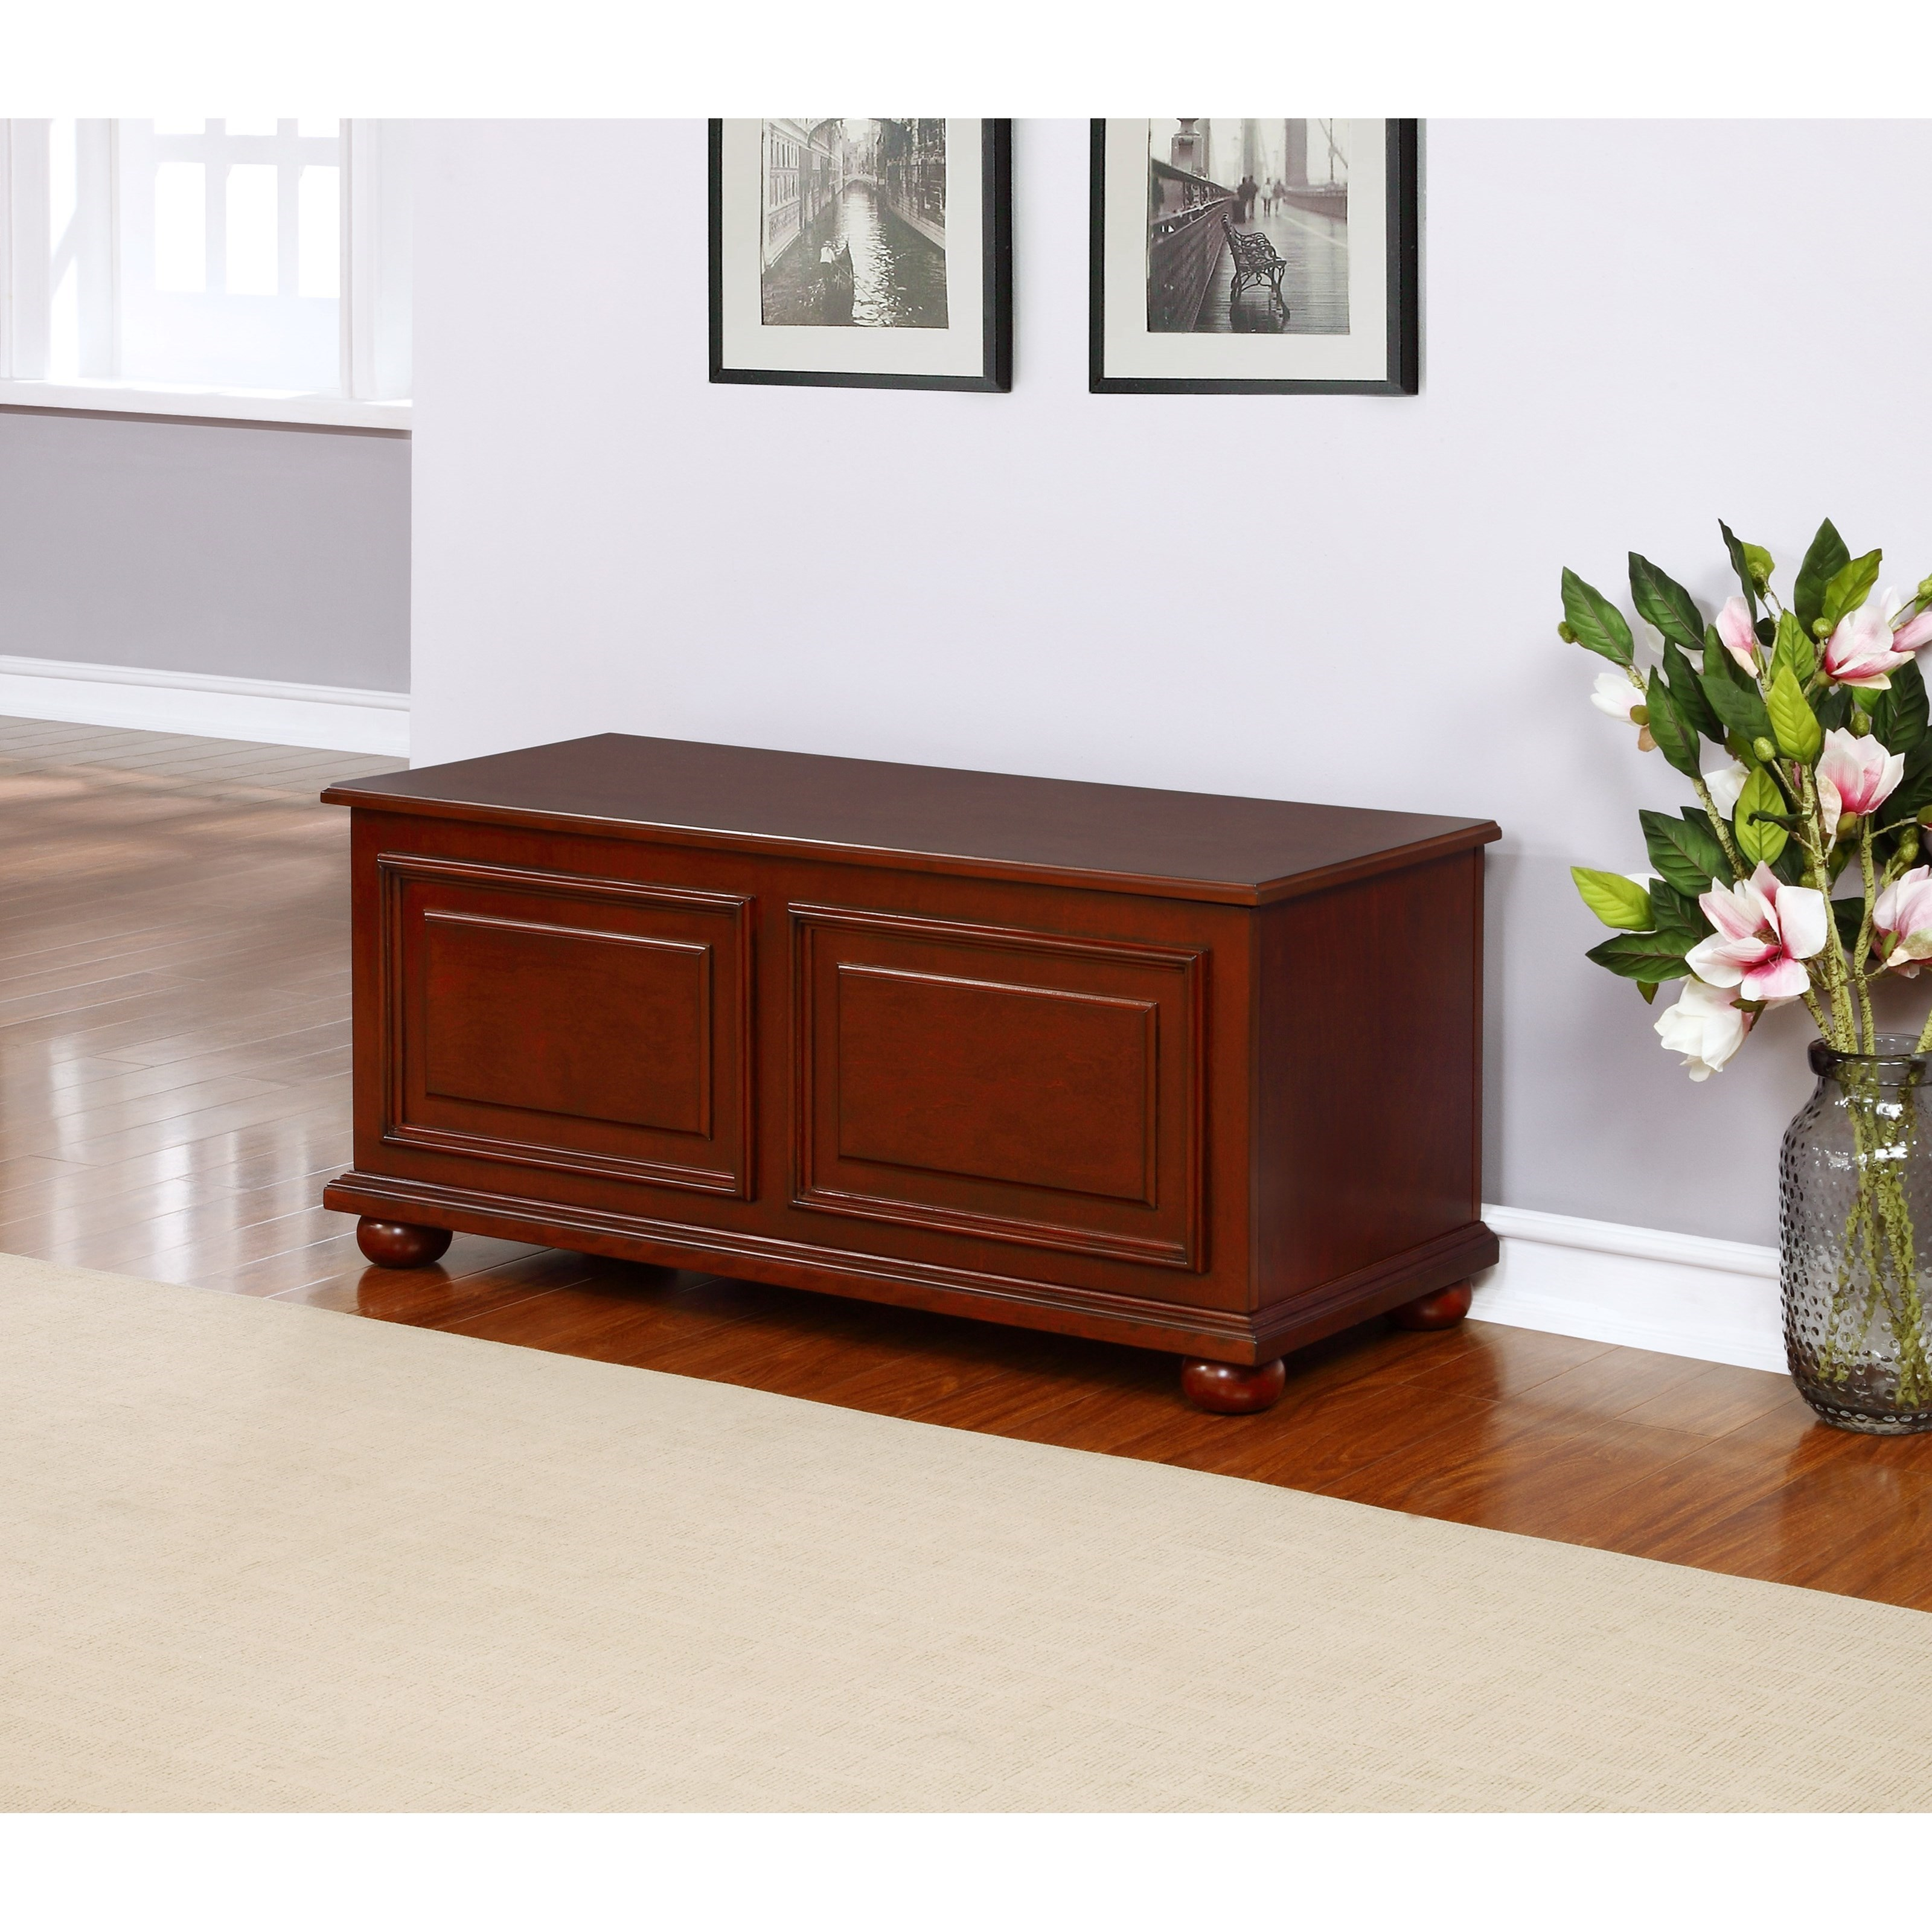 Accent Furniture Cedar Chest by Powell at Nassau Furniture and Mattress